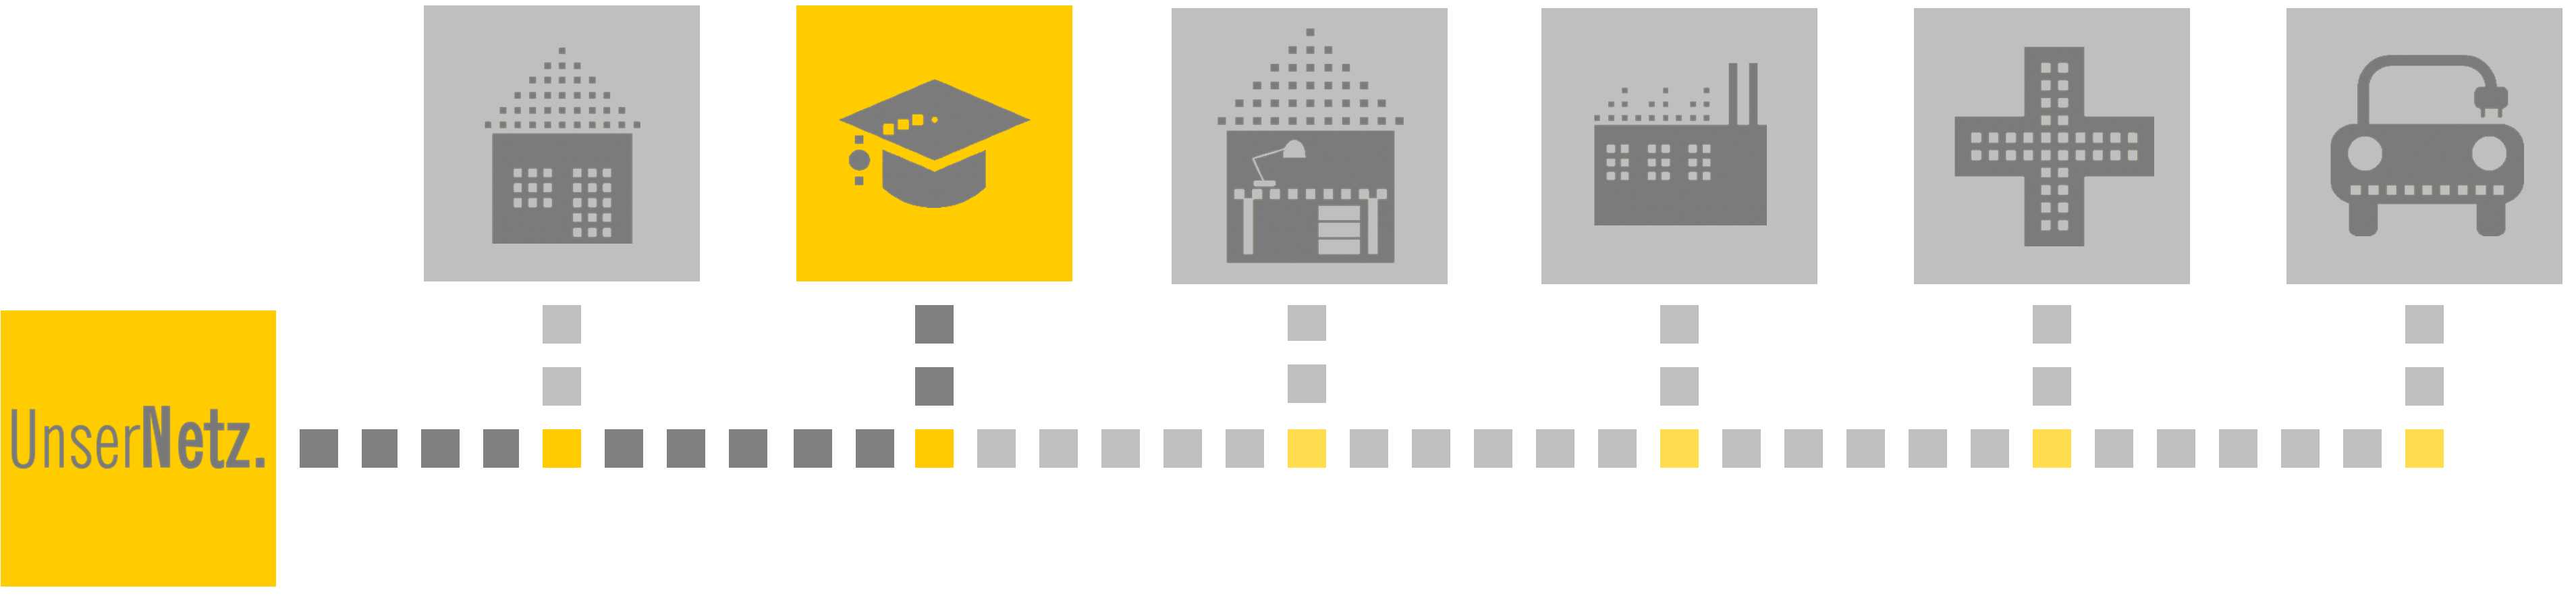 Icons-UnserNetz_Schule